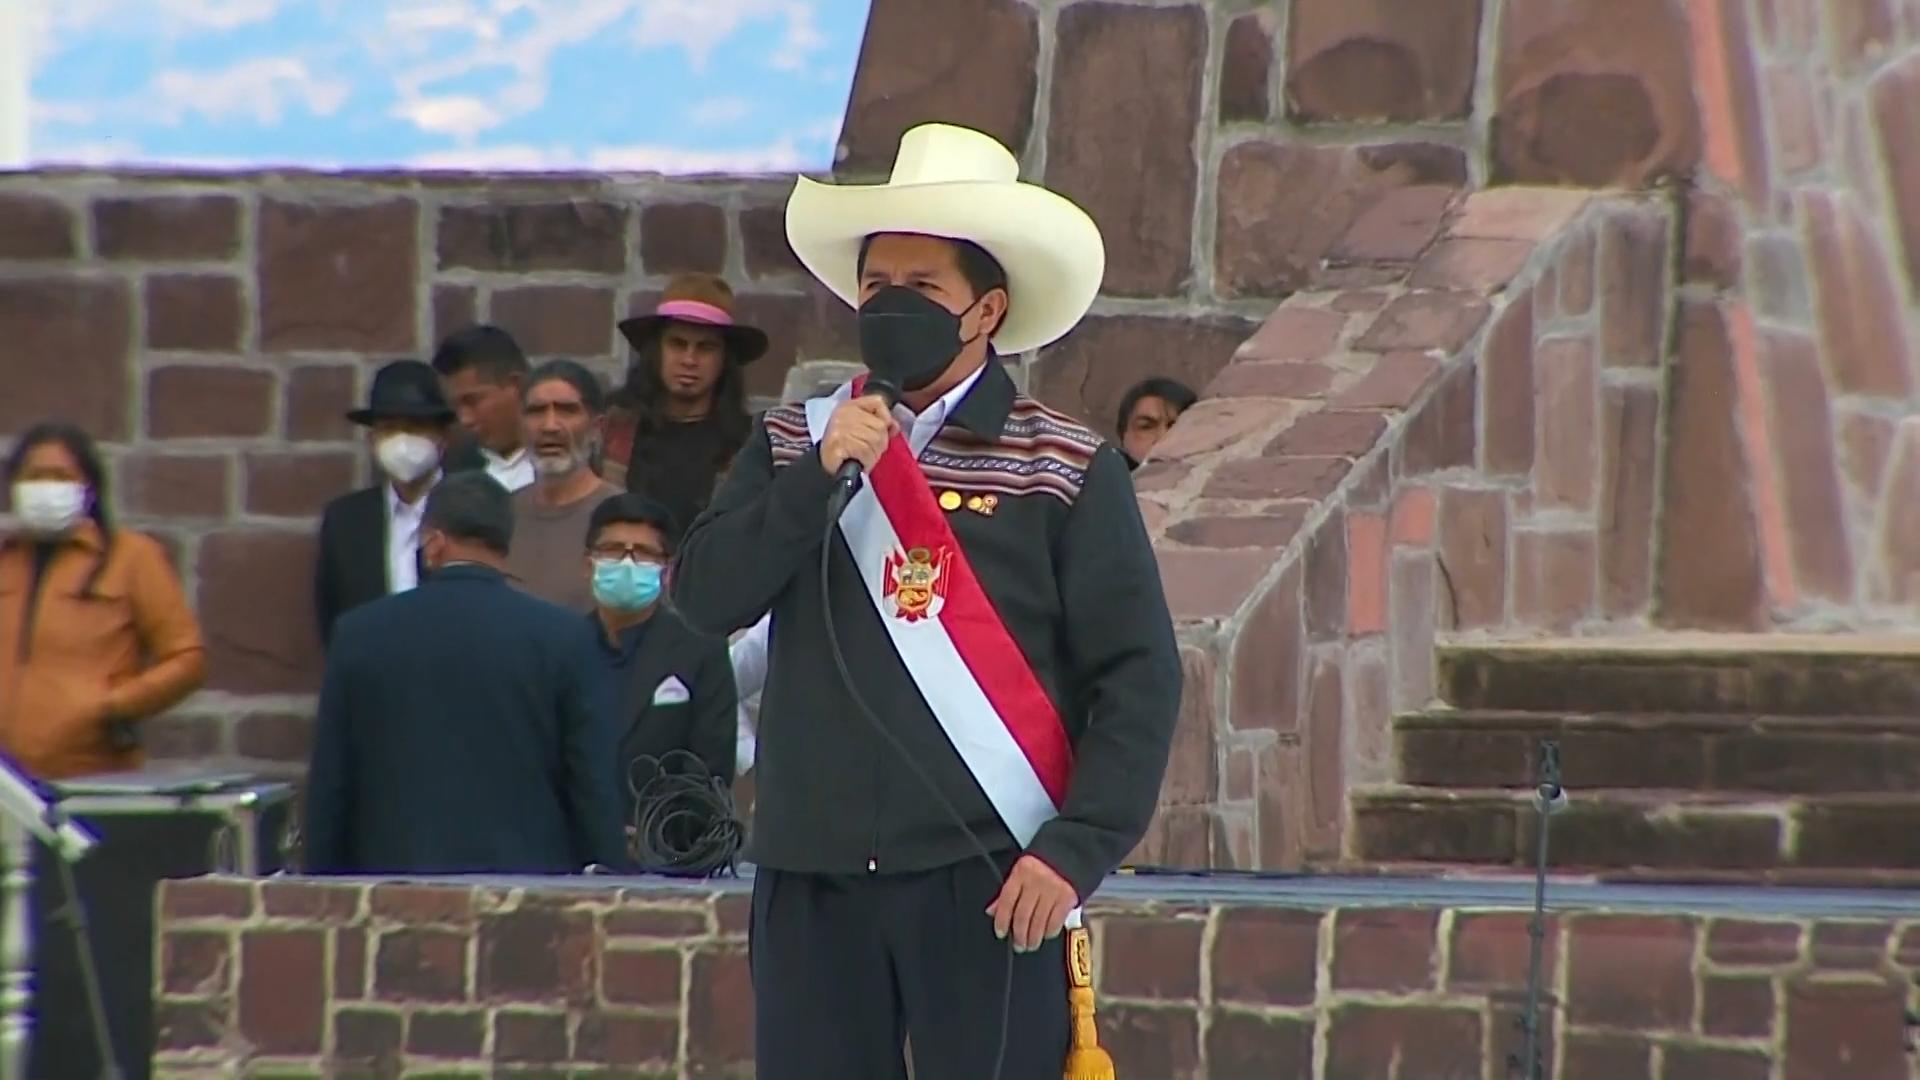 Rural teacher installed as President in Peru